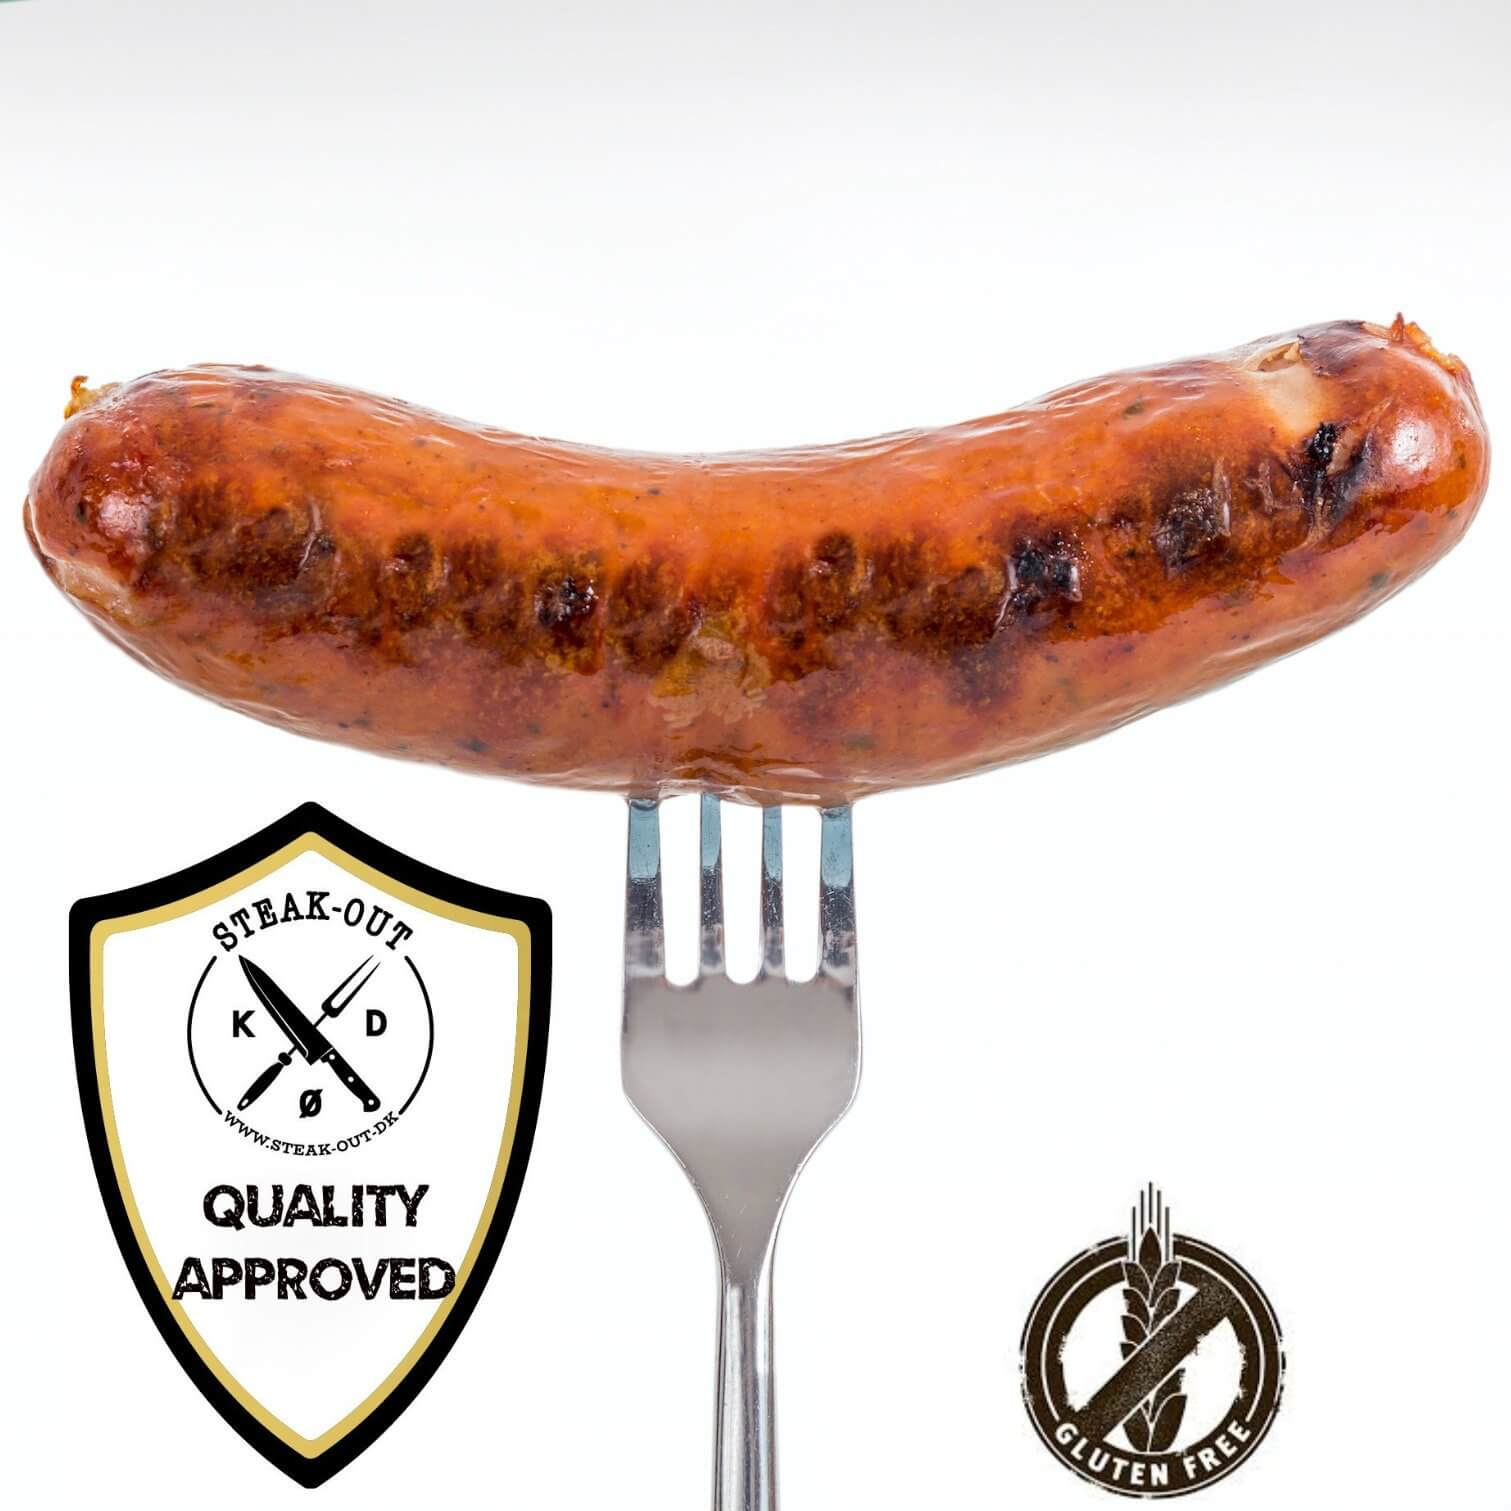 Bacon Griller. 5 stk á 100 gram. Frostvare